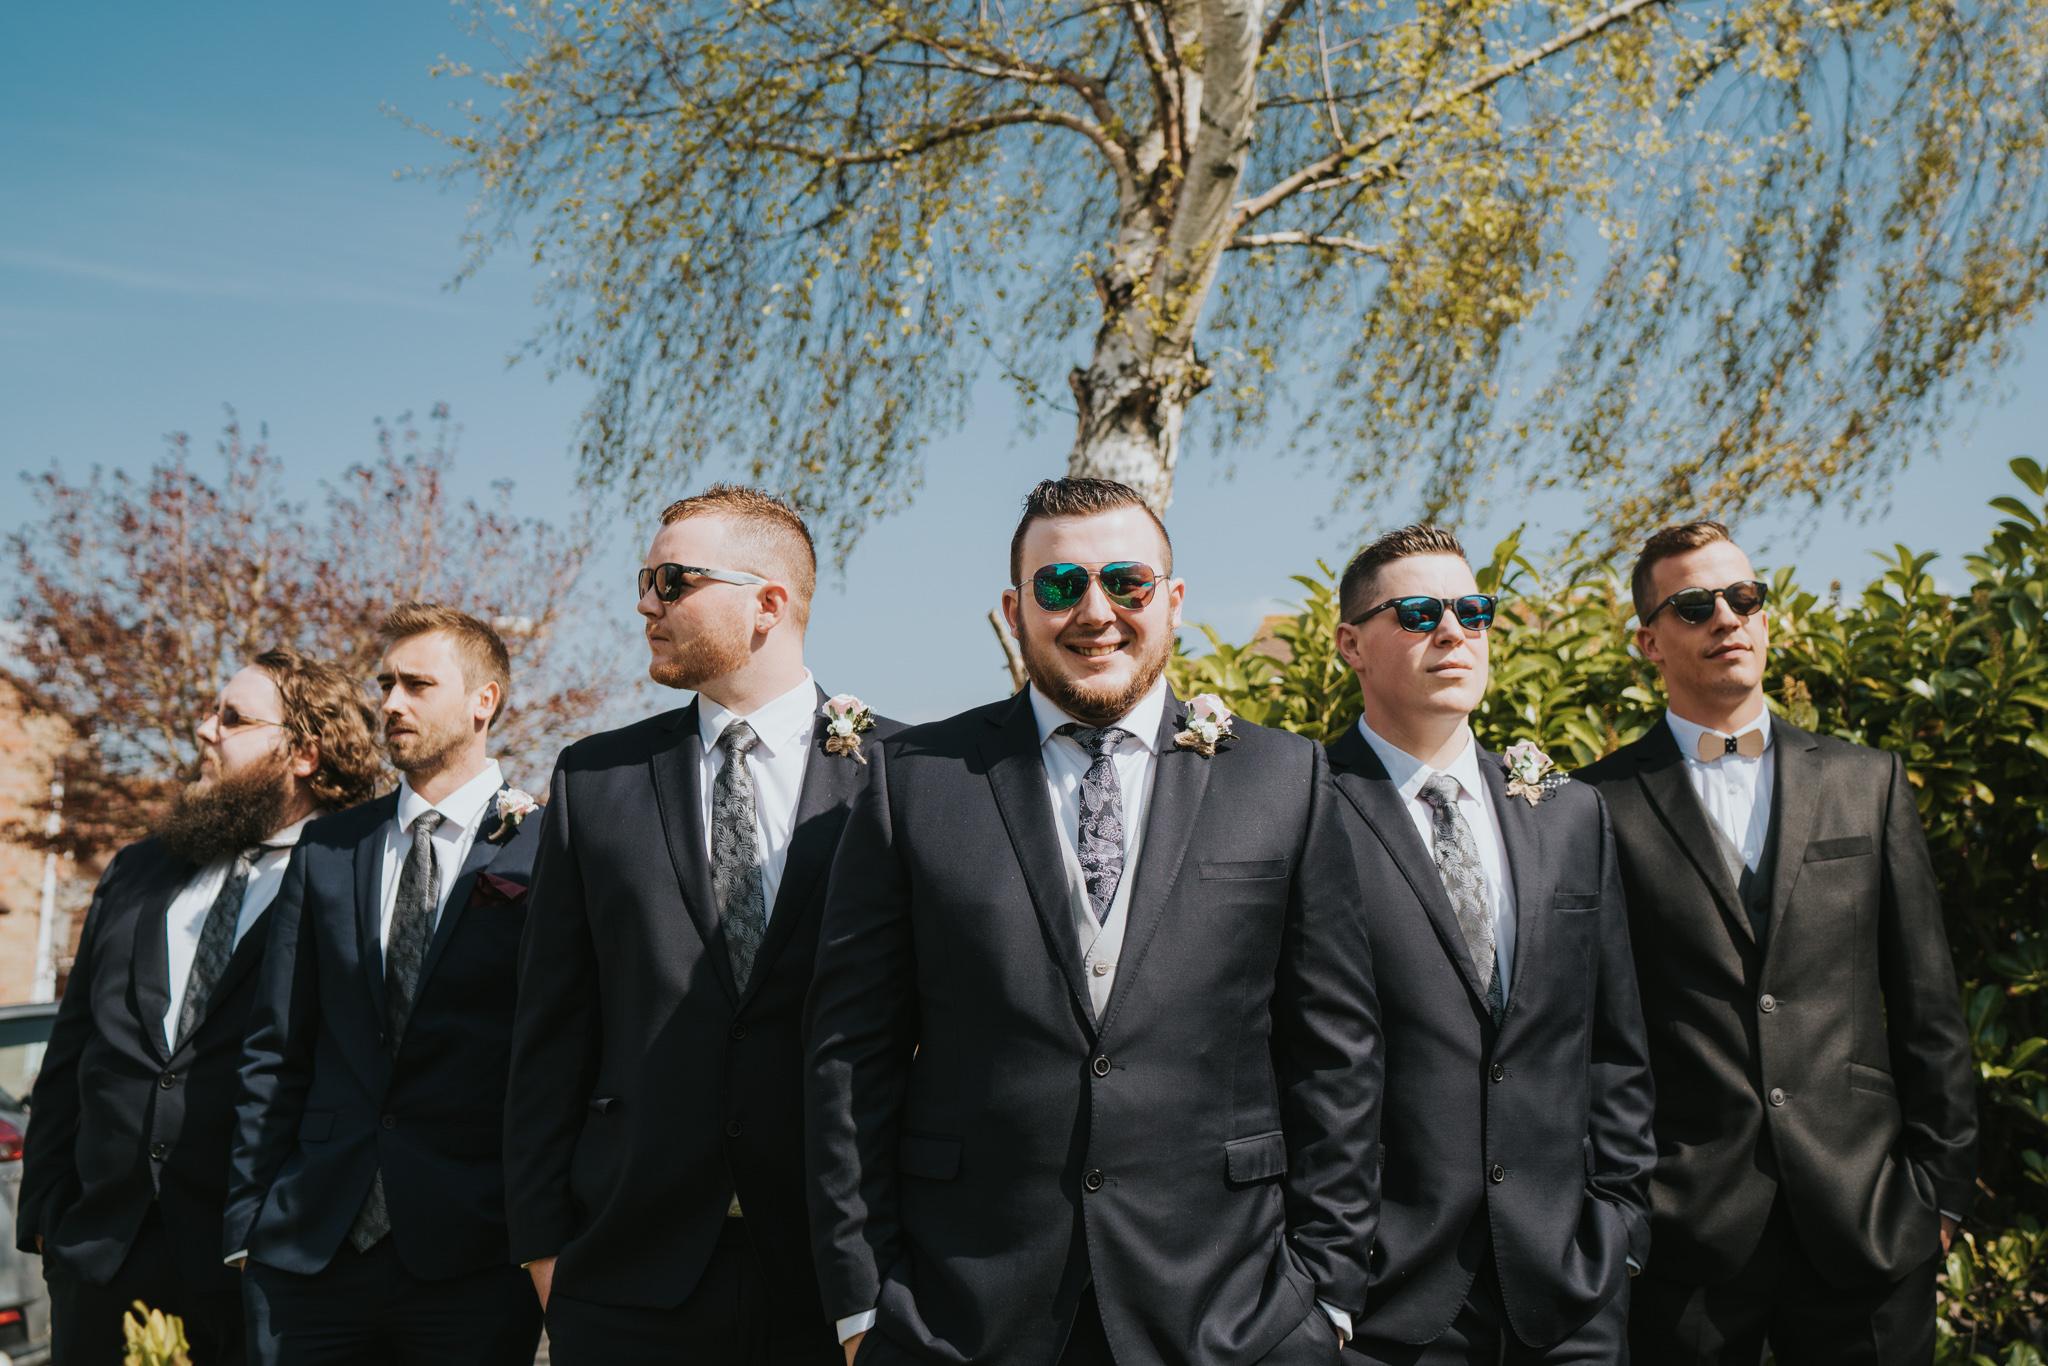 grace-sam-old-barn-clovelly-devon-wedding-photographer-grace-elizabeth-essex-suffolk-norfolk-wedding-photographer (20 of 132).jpg